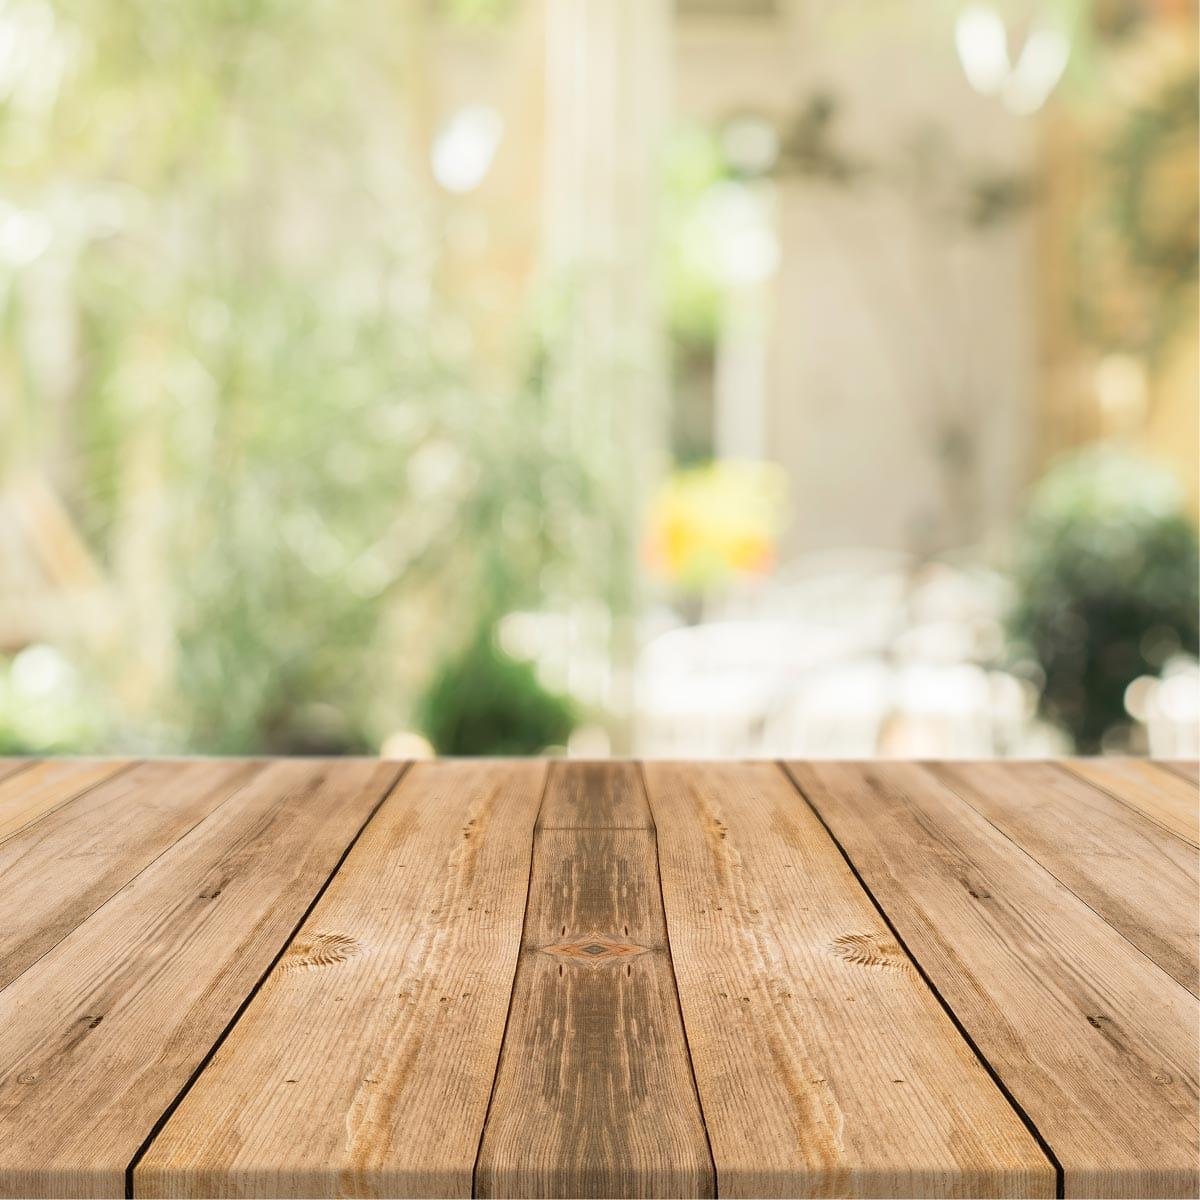 How To Blur Photo Background In Coreldraw